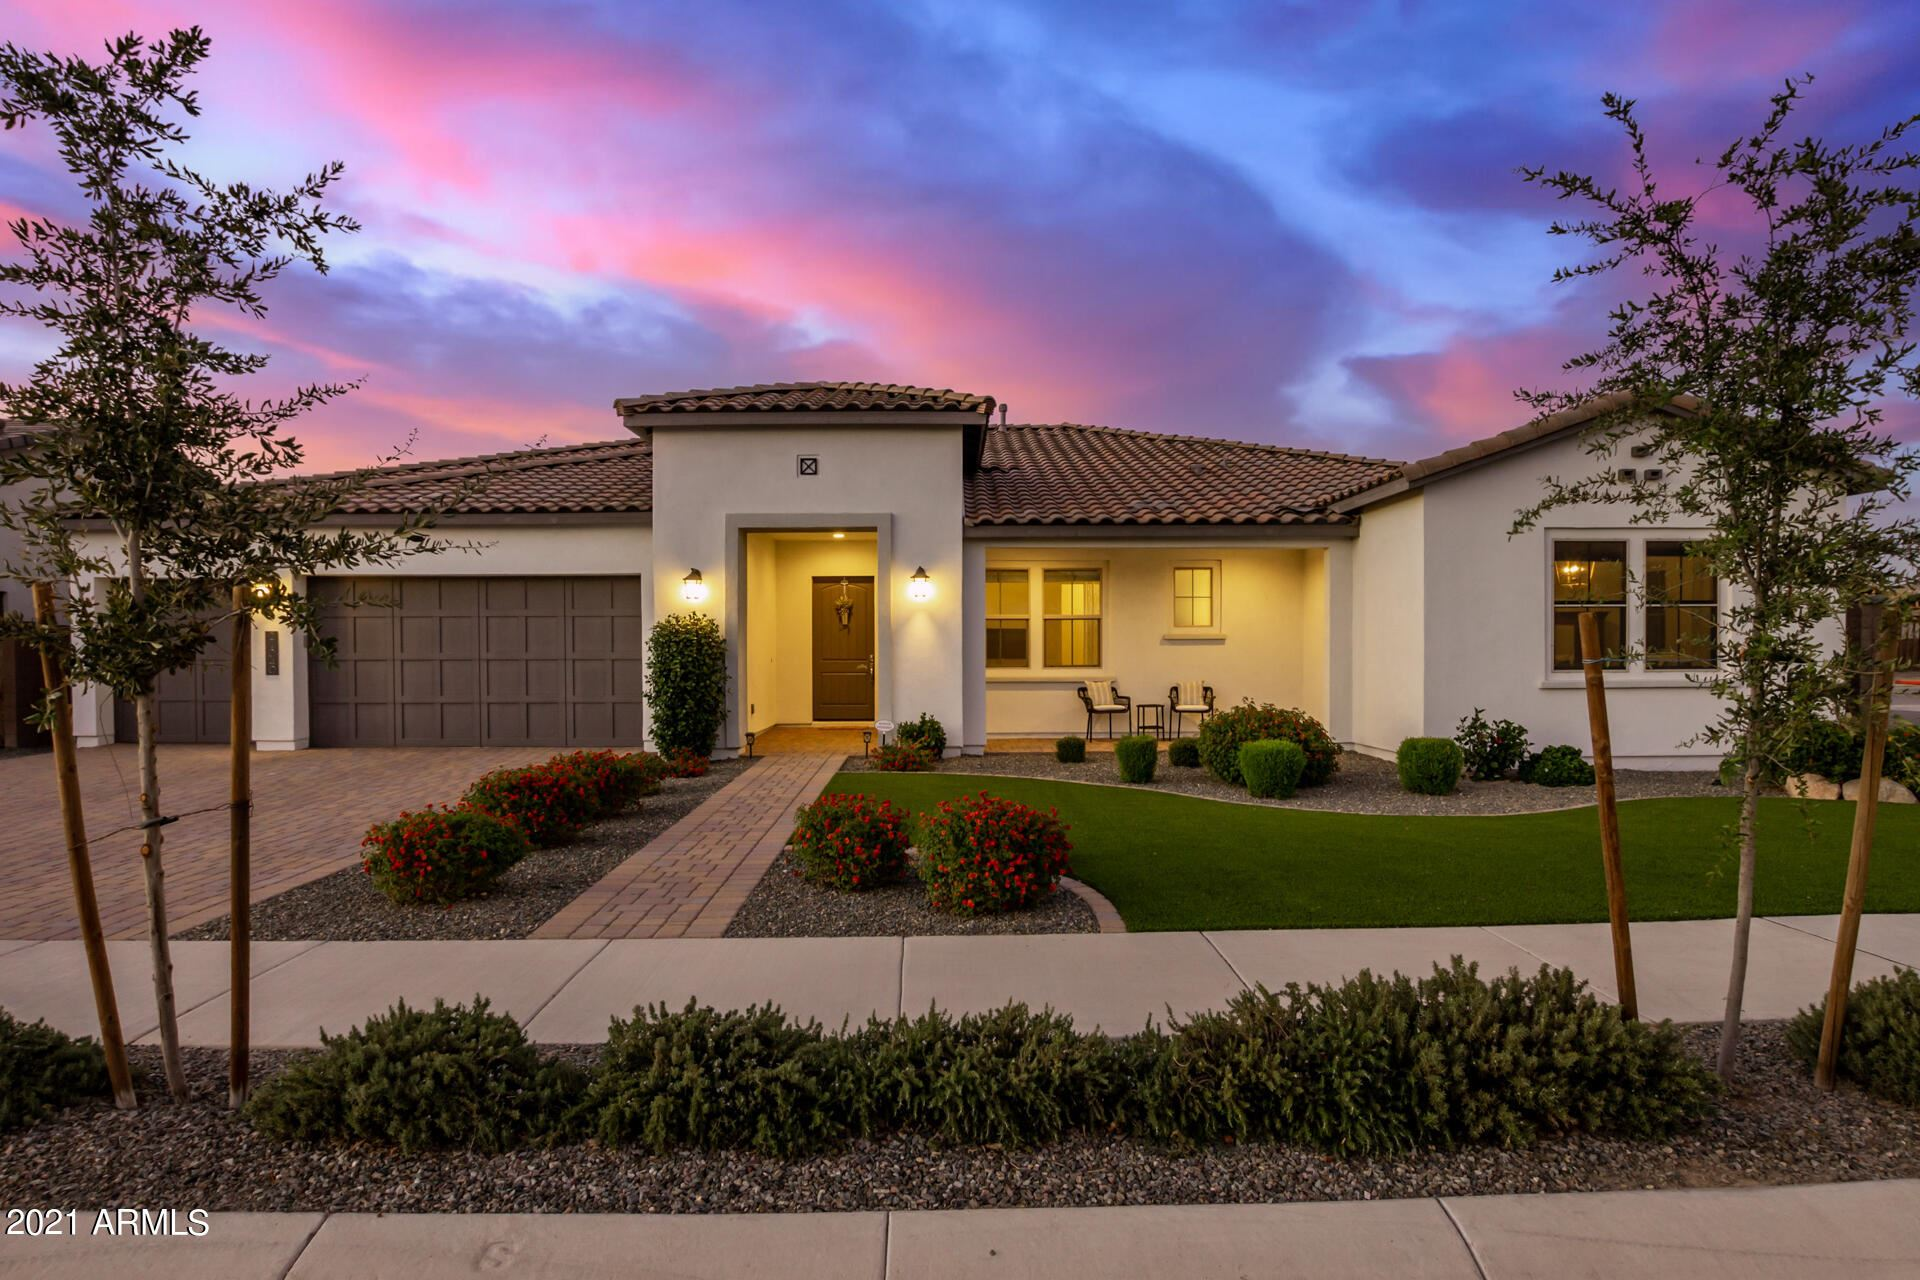 Photo of 21040 E SPARROW Drive, Queen Creek, AZ 85142 (MLS # 6306875)